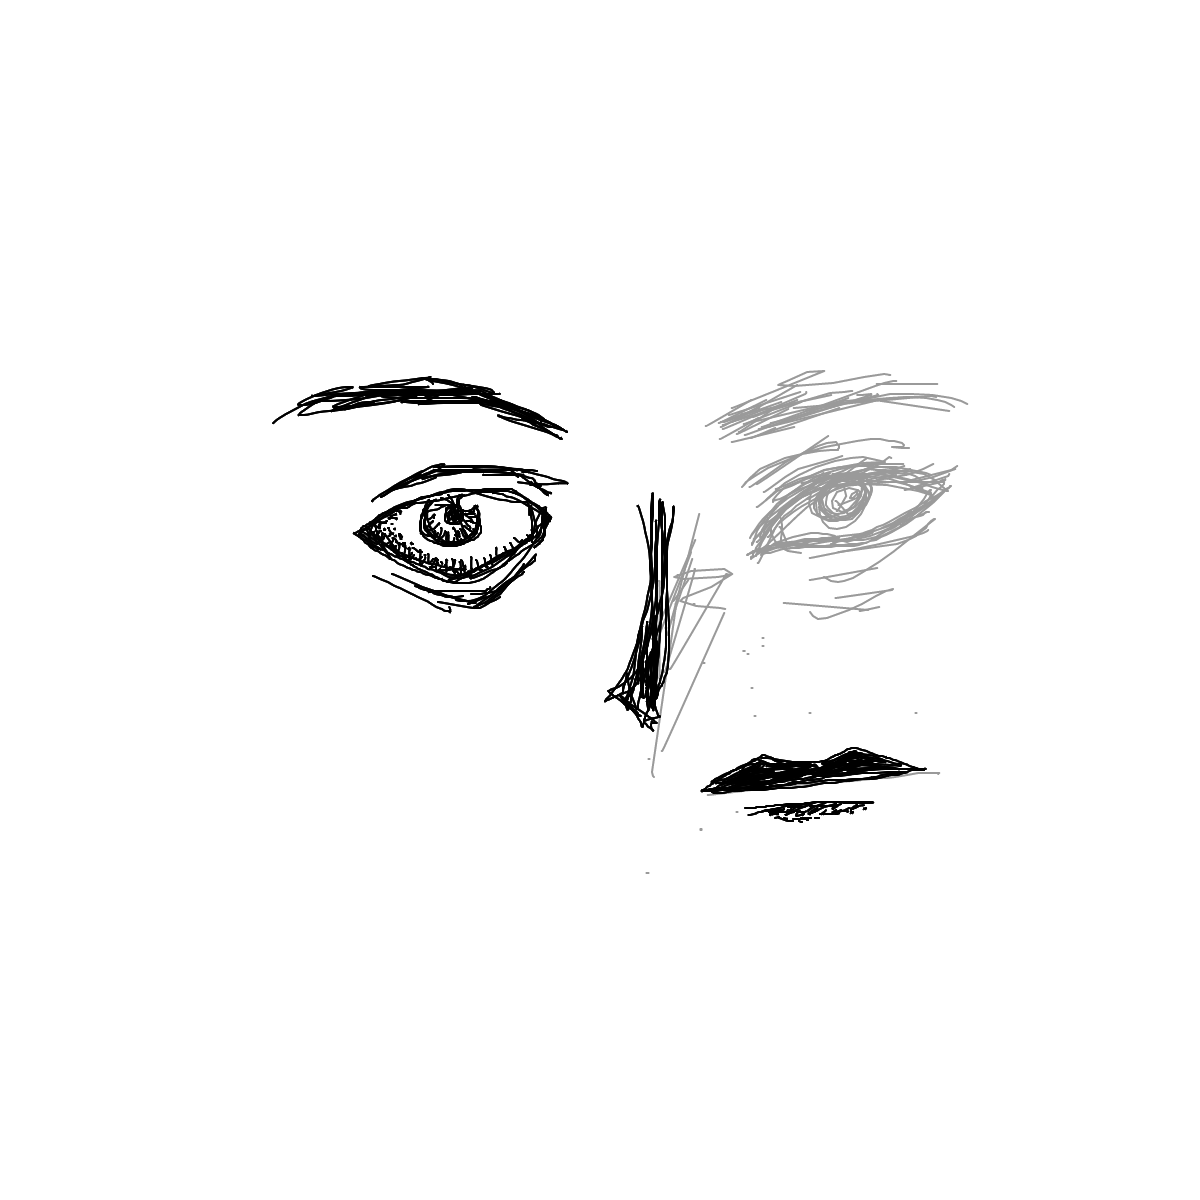 BAAAM drawing#755 lat:46.3255958557128900lng: -63.2139778137207000